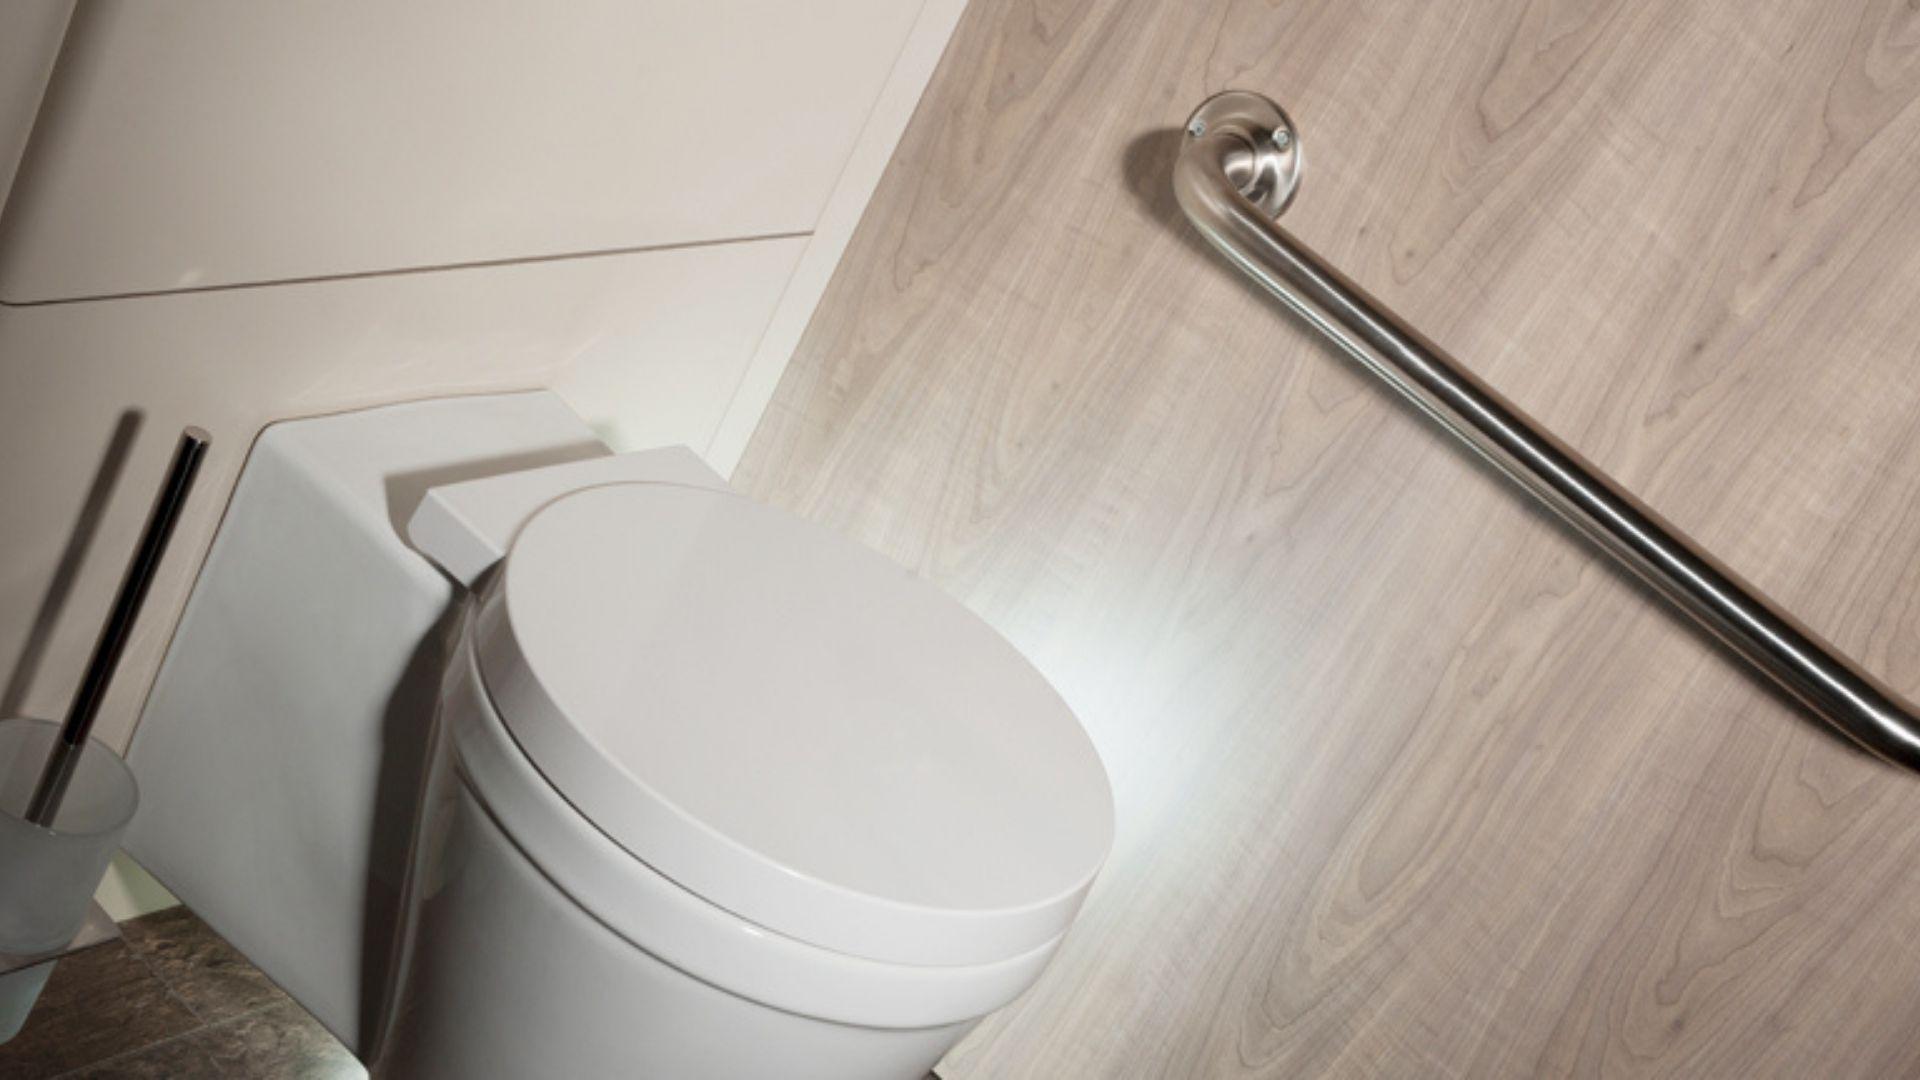 Stature washroom sanitaryware